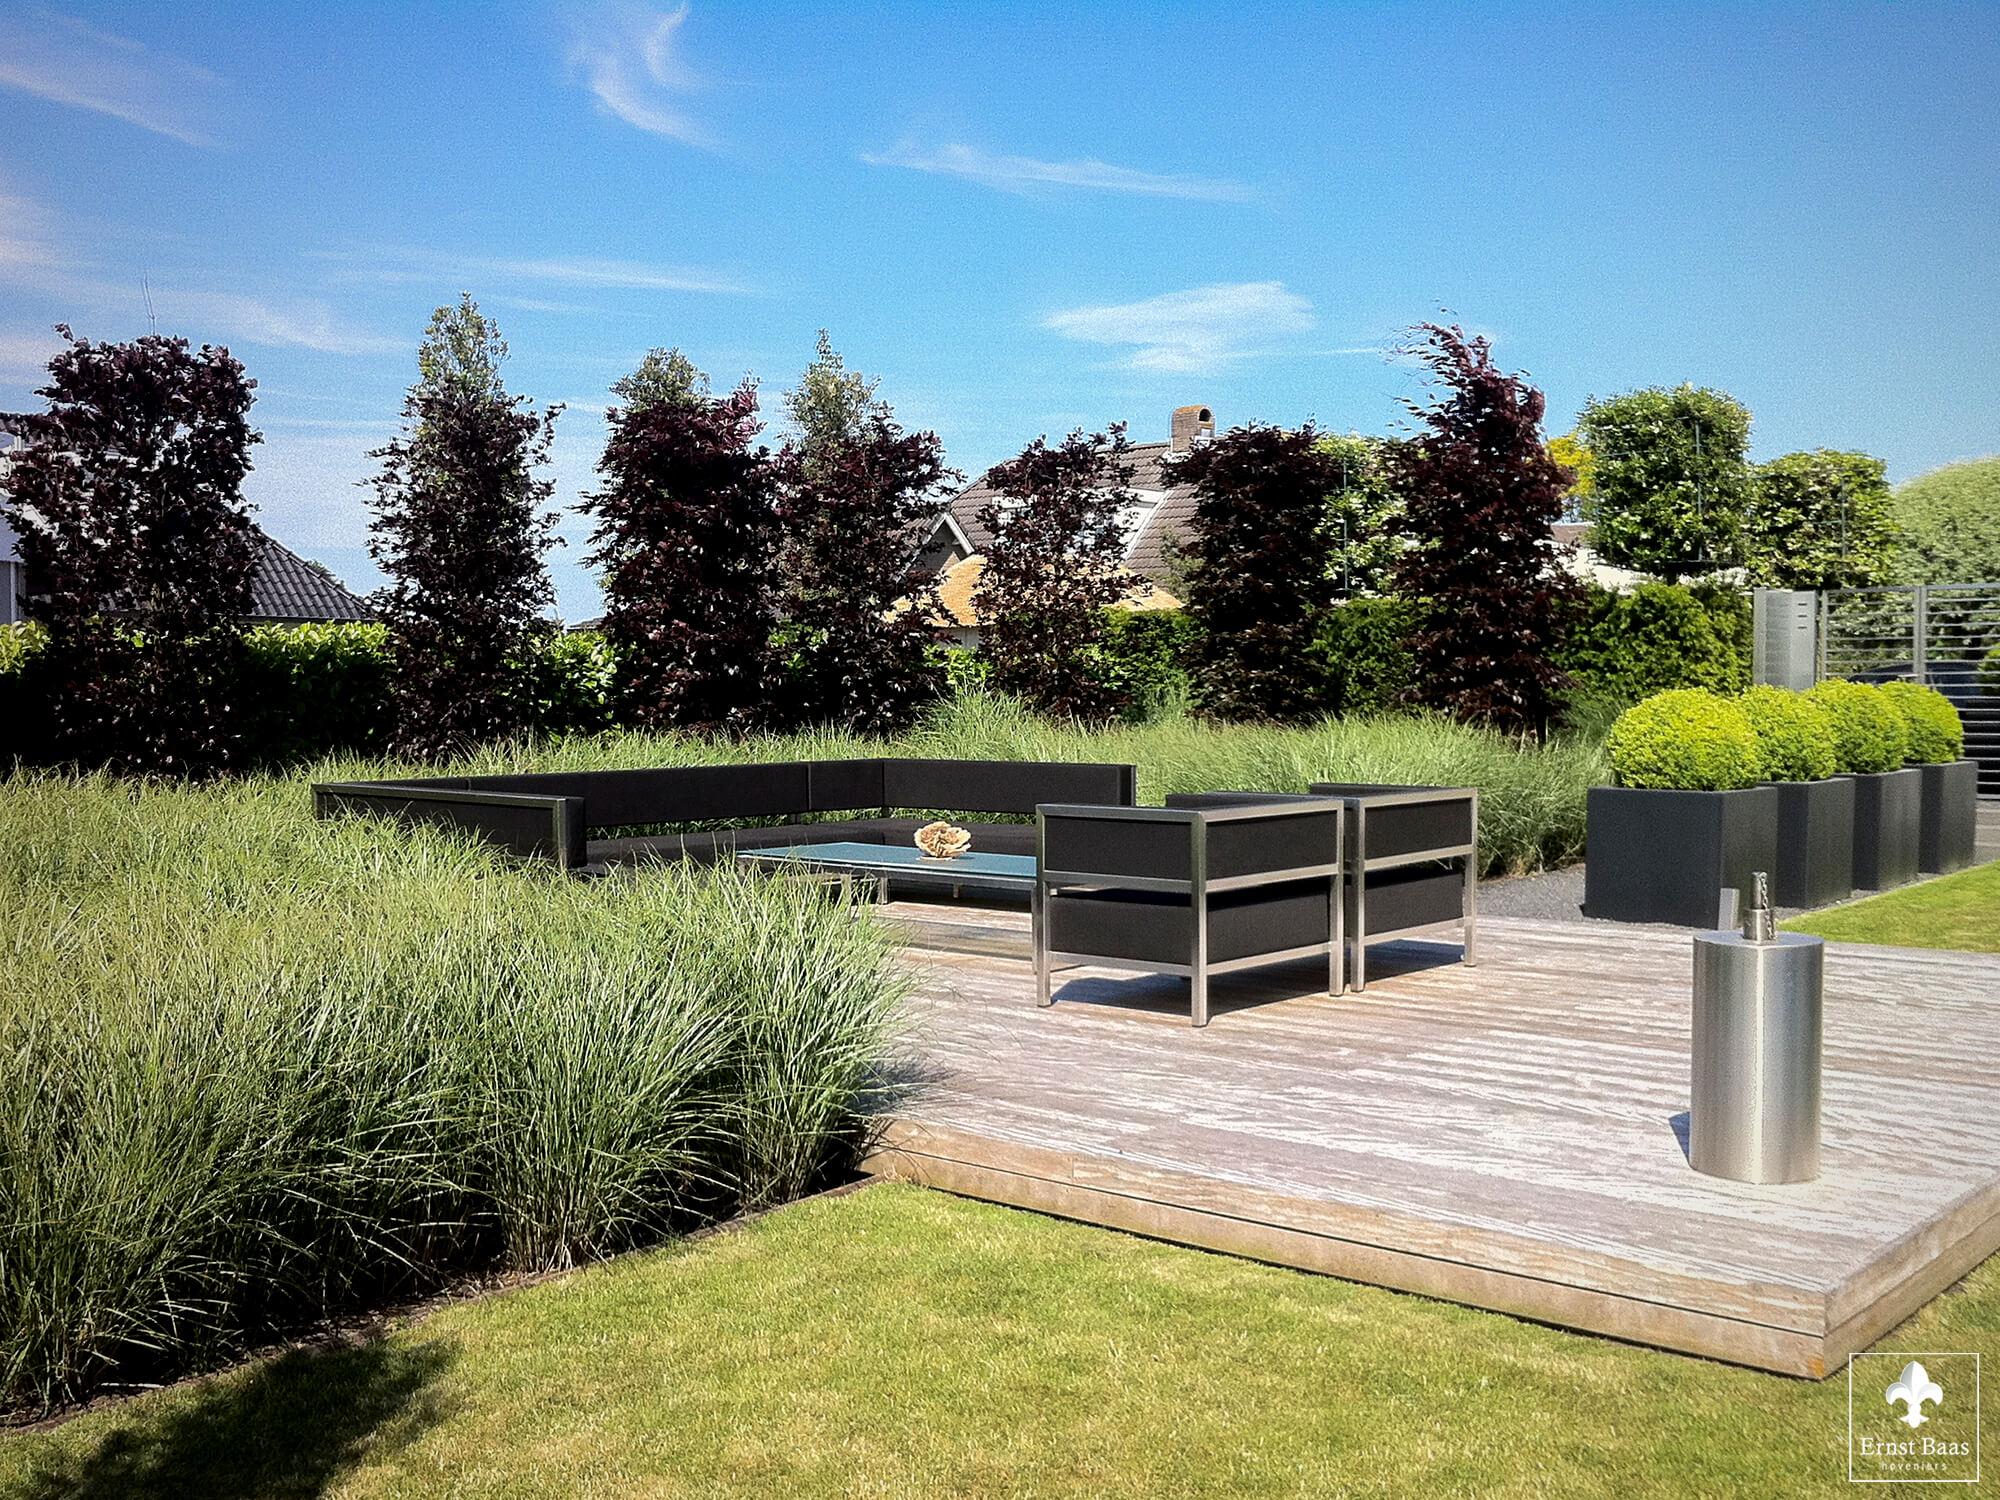 Grote Moderne Tuin : Moderne tuinen ernst baas hoveniersbedrijf in waddinxveen